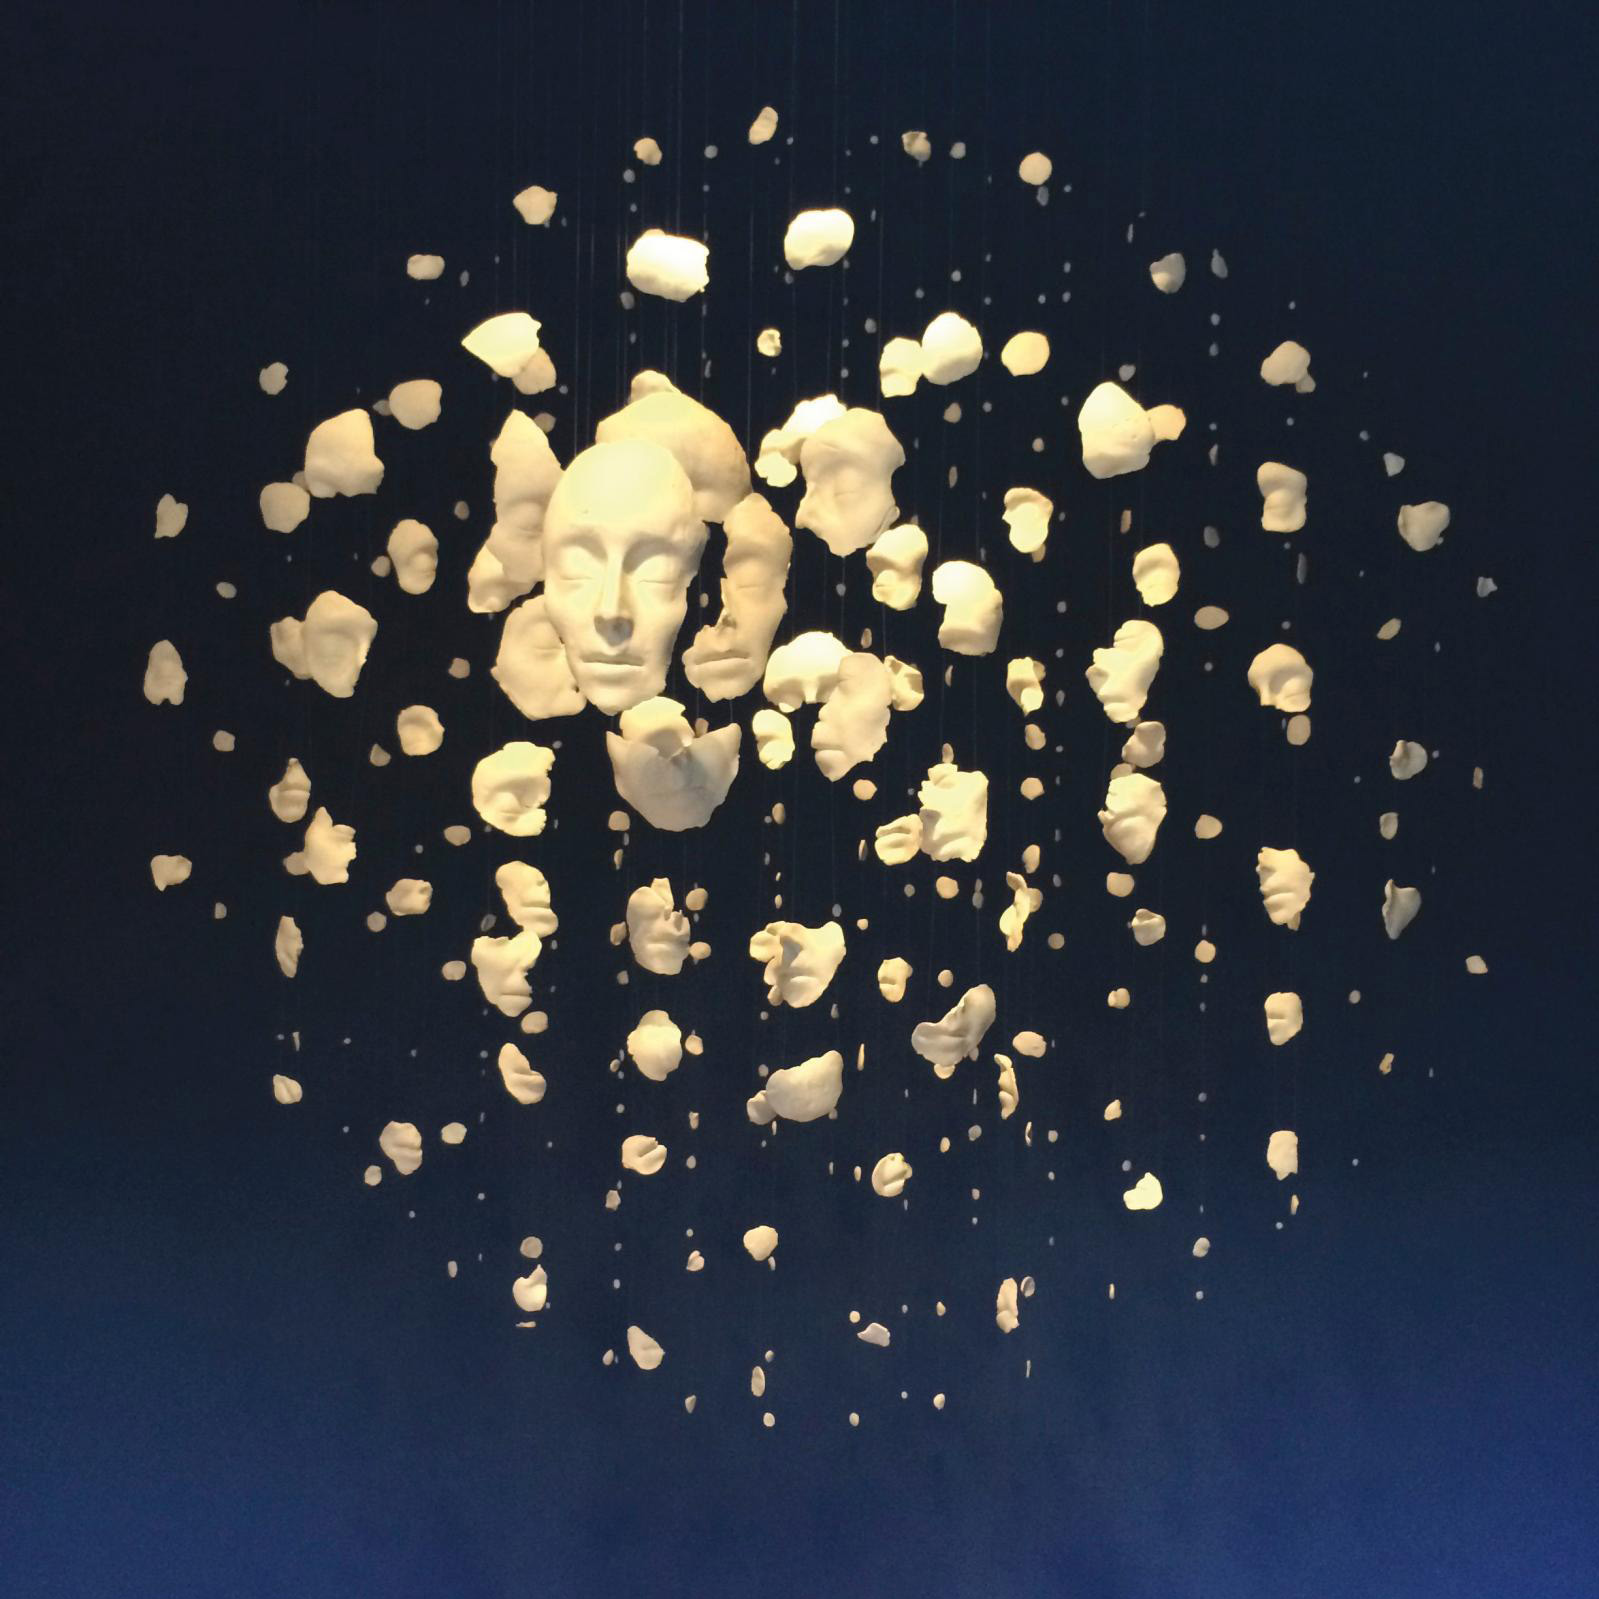 Samuel Yal, Dissolution, ceramic, 180 x 180 x 180 cm (70.86 x 70.86 x 70.86 in), 2012. Courtesy Galerie La Forest Divonne and Fondation Boghossian - Villa Empain